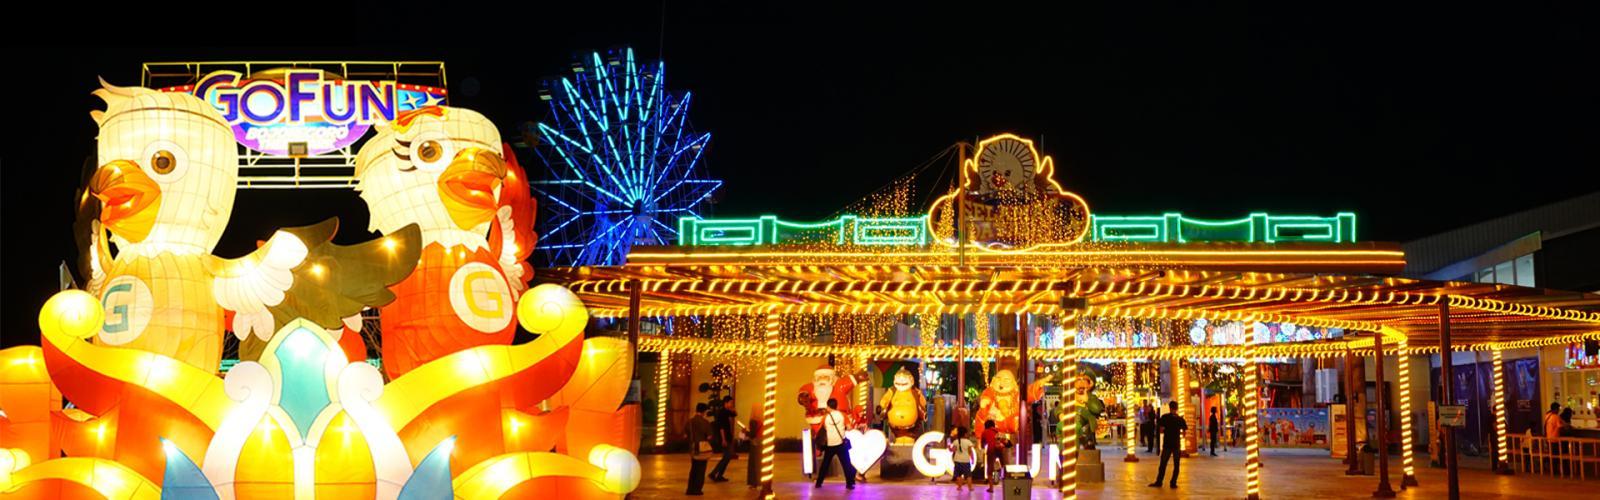 Wisata Gofun Bojonegoro Wajib Dikunjungi Komple Taman Hiburan Kab